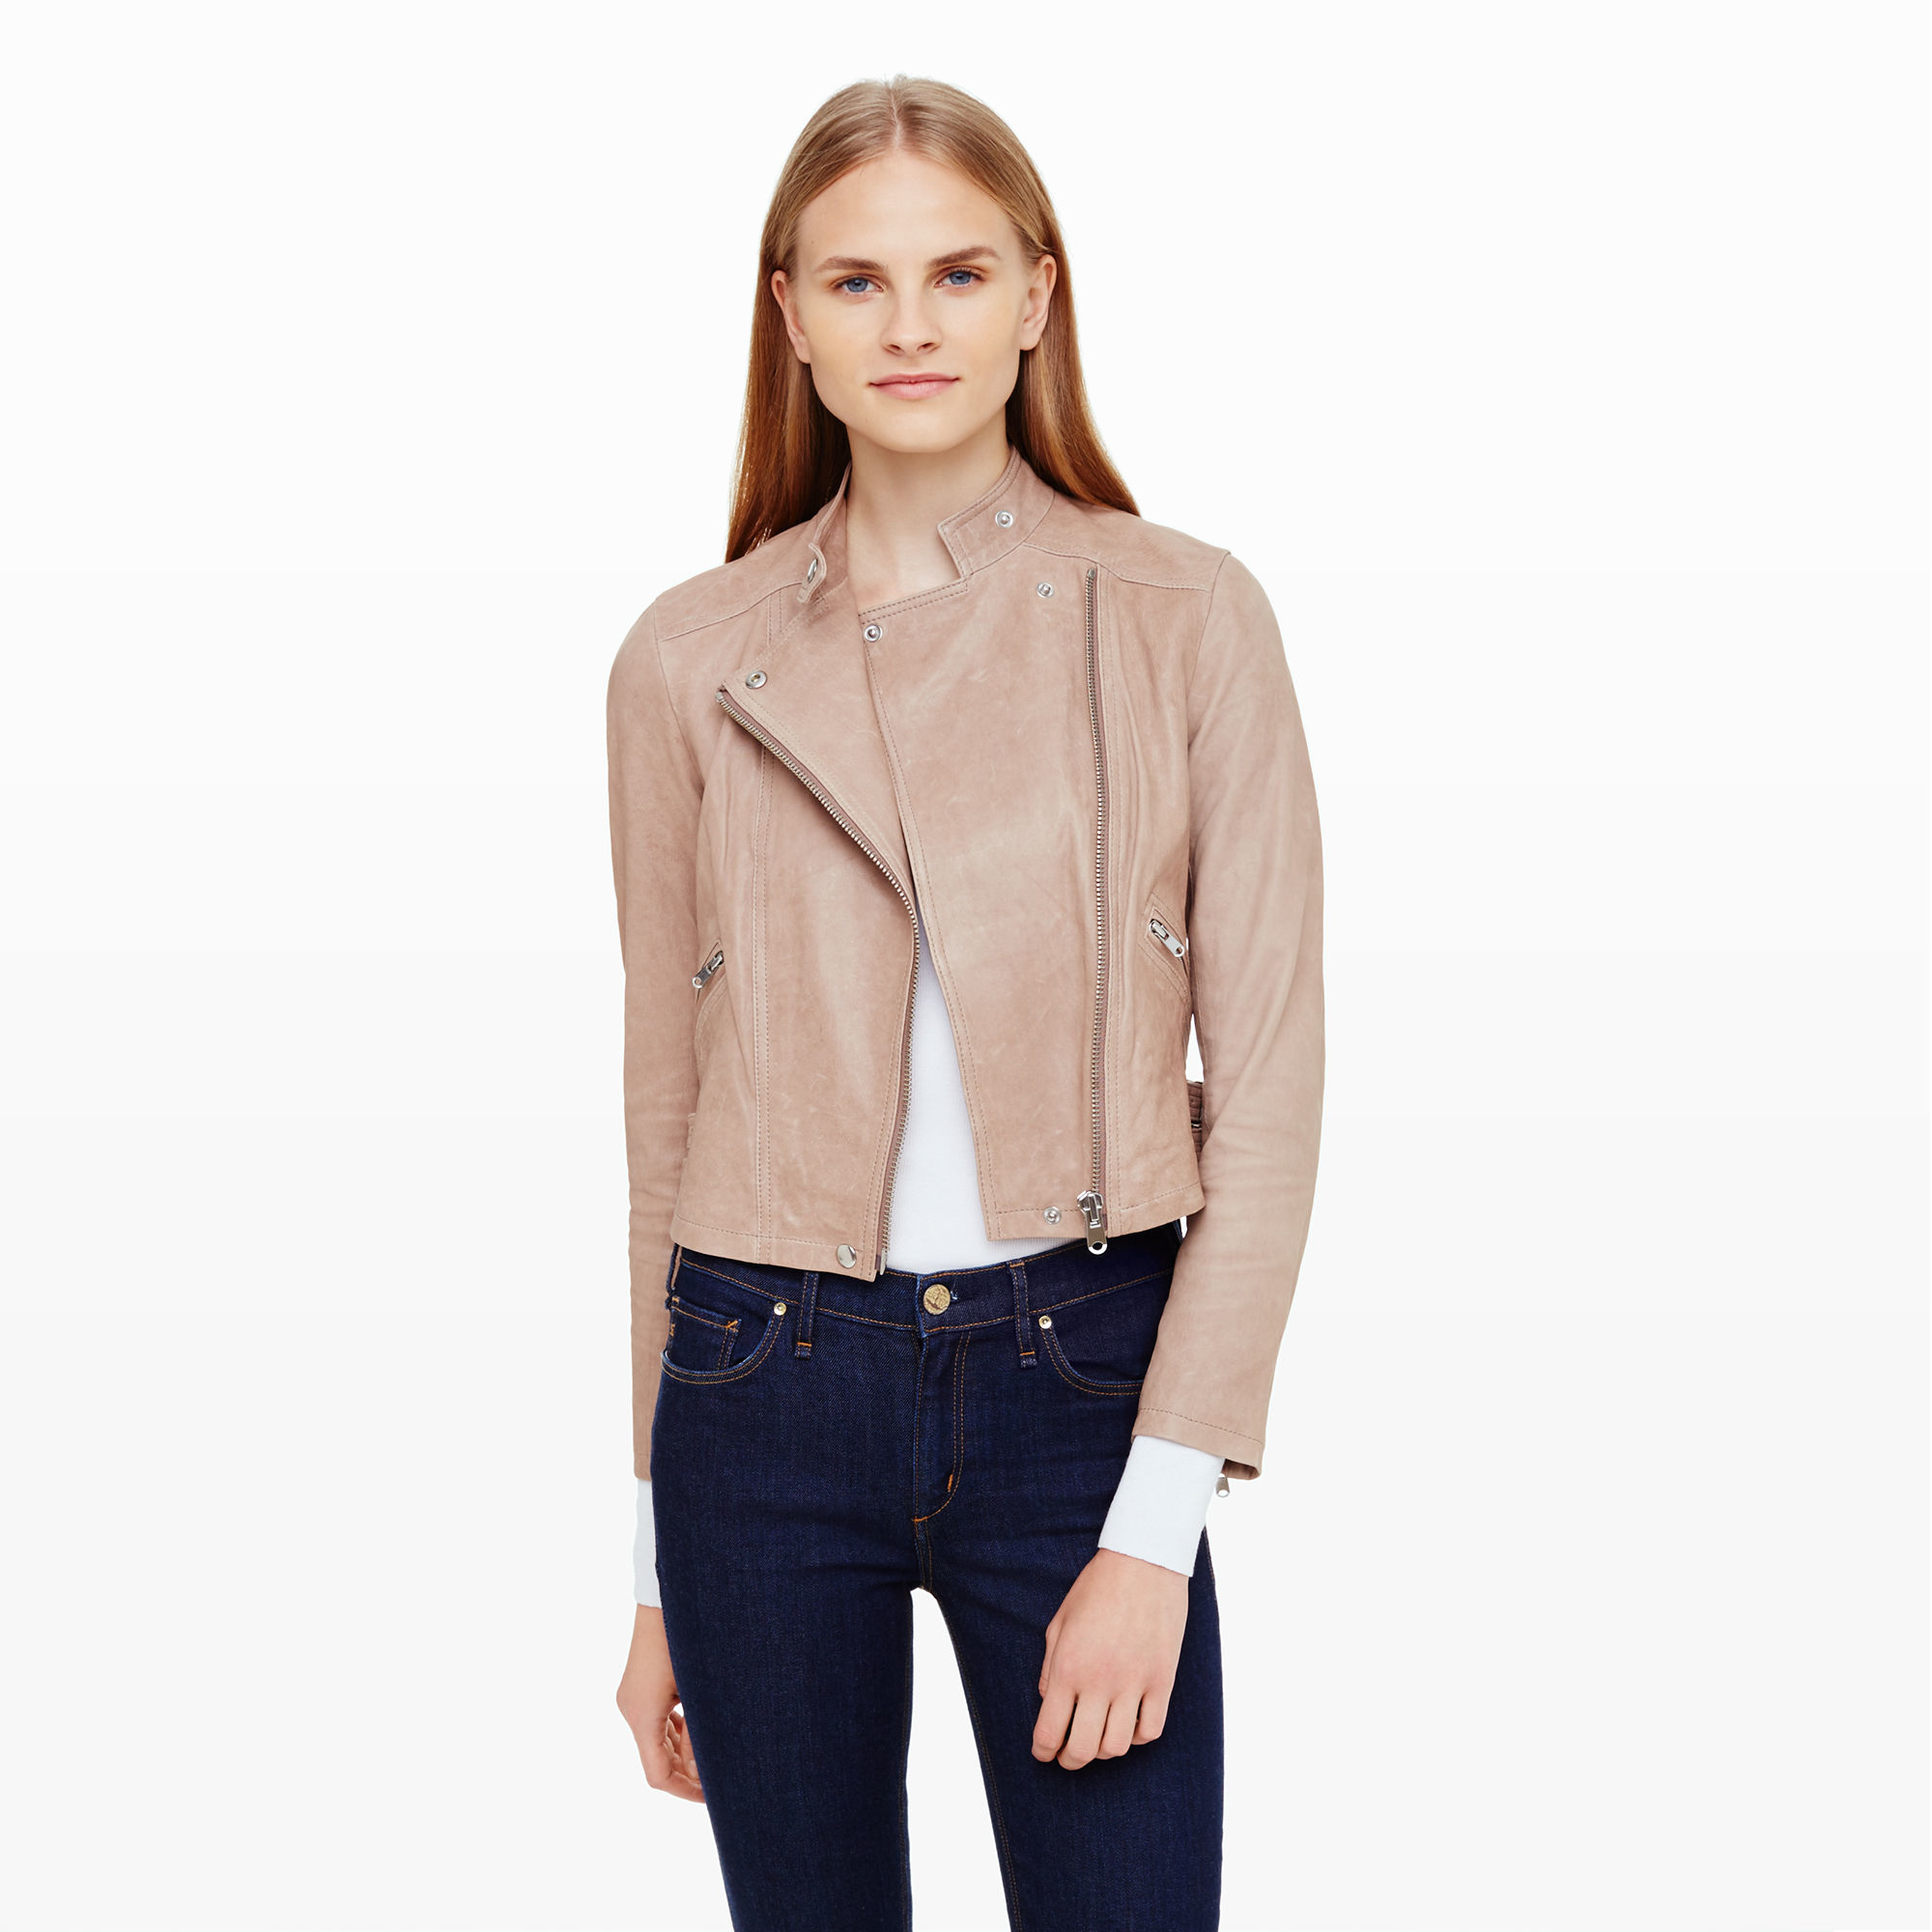 Lyst club monaco jayda leather jacket in natural jpg 2000x2000 Club monaco  moto jacket 6f46a4bb1